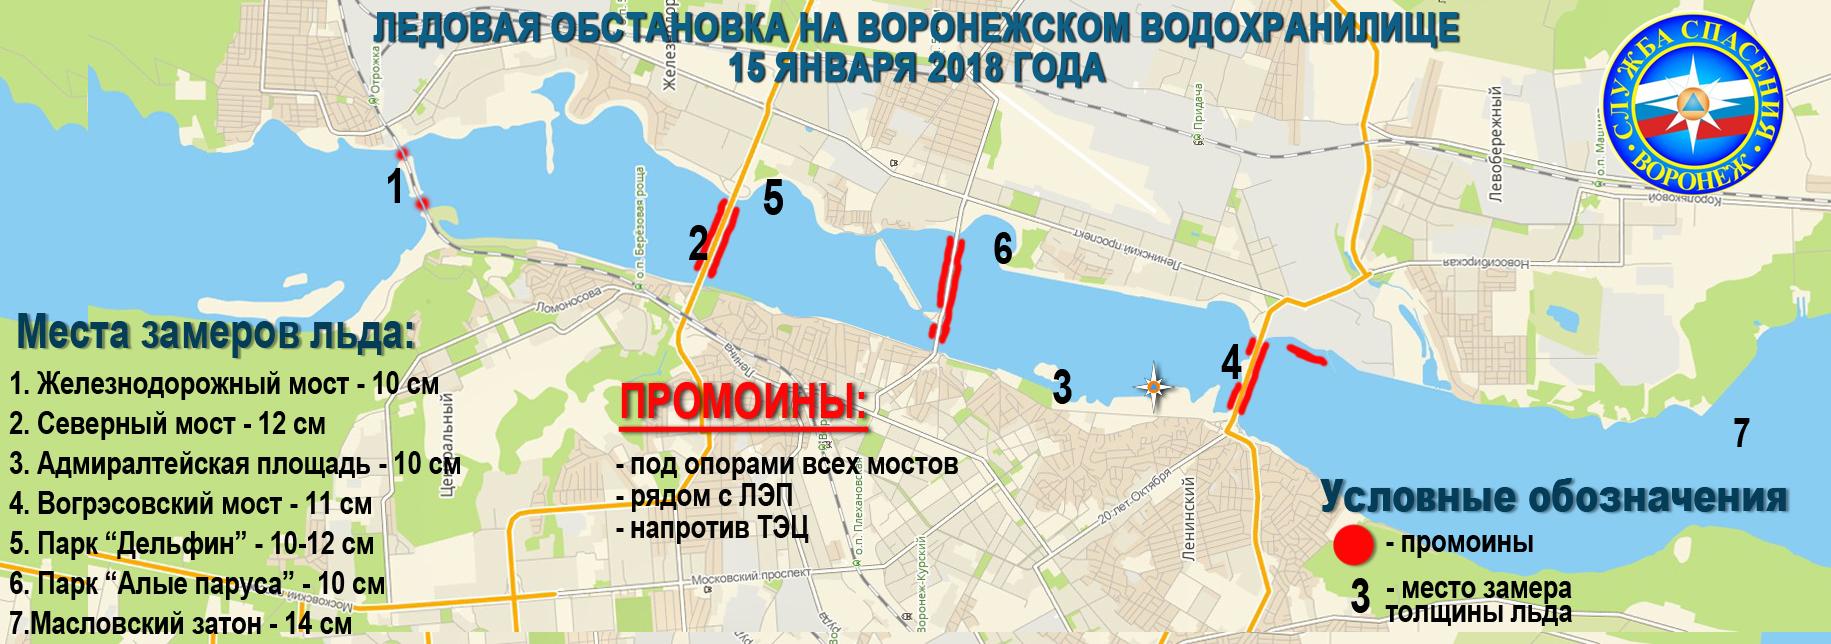 http://sg.uploads.ru/7YaR2.jpg